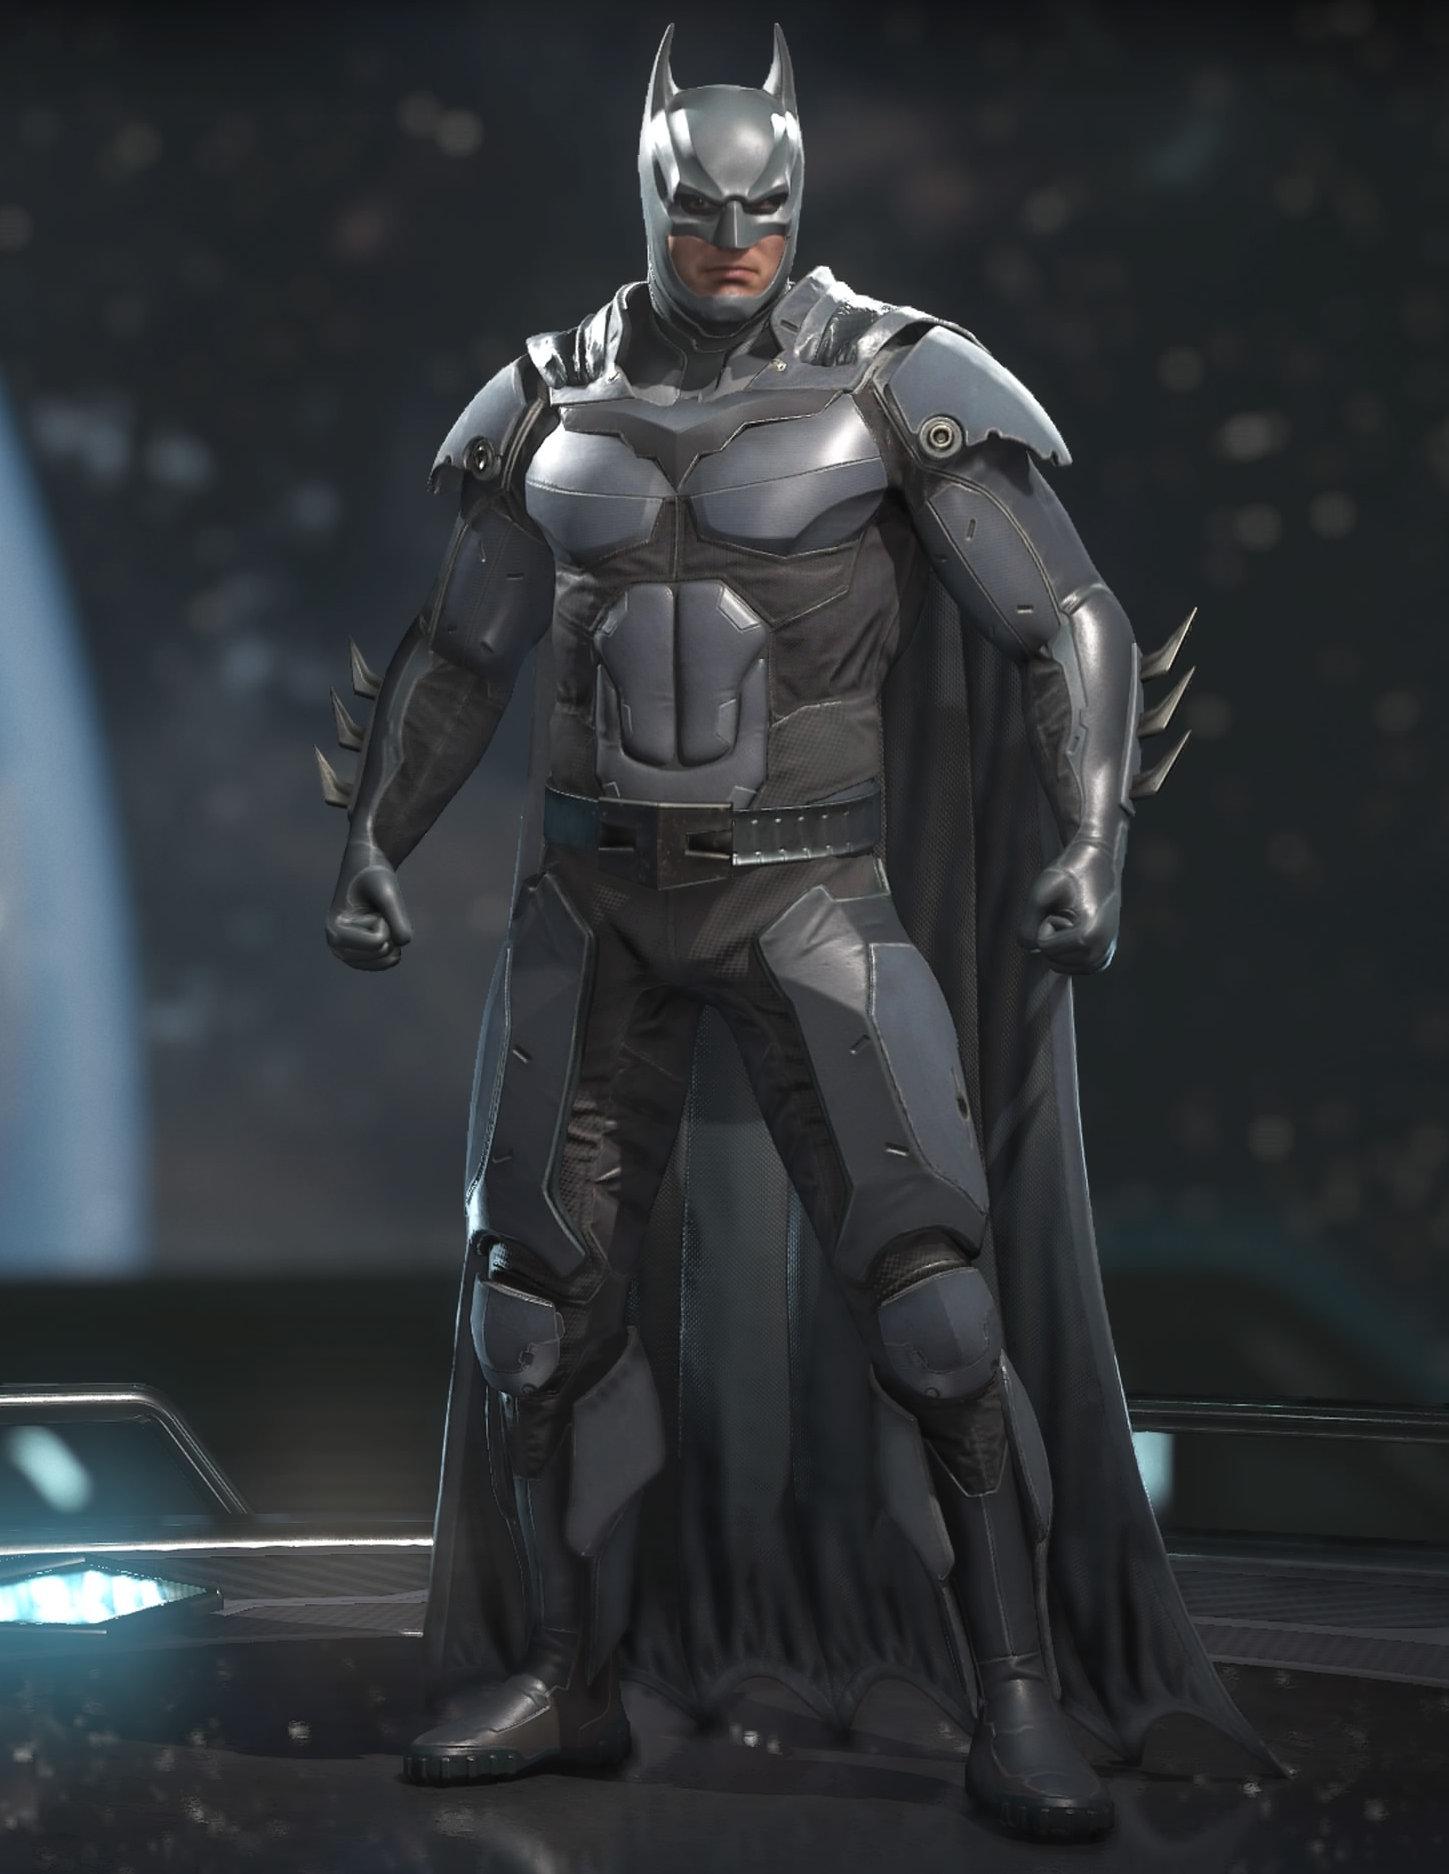 Batman - AK Battle Armor 5U89R & Batman (Bruce Wayne)/Gallery | Injustice:Gods Among Us Wiki | FANDOM ...